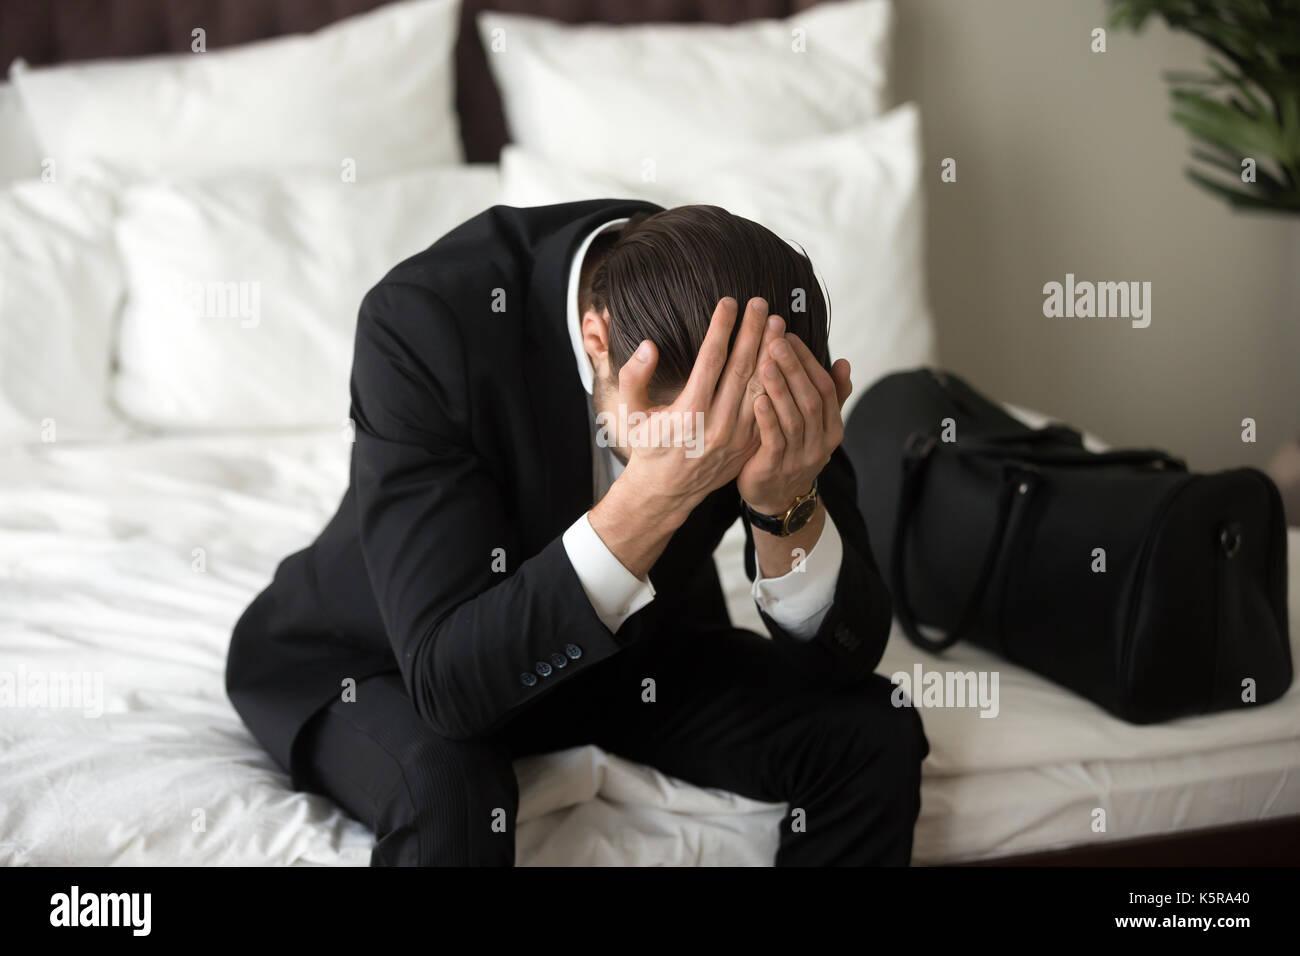 Stressed upset businessman sitting on bed, having headache. - Stock Image